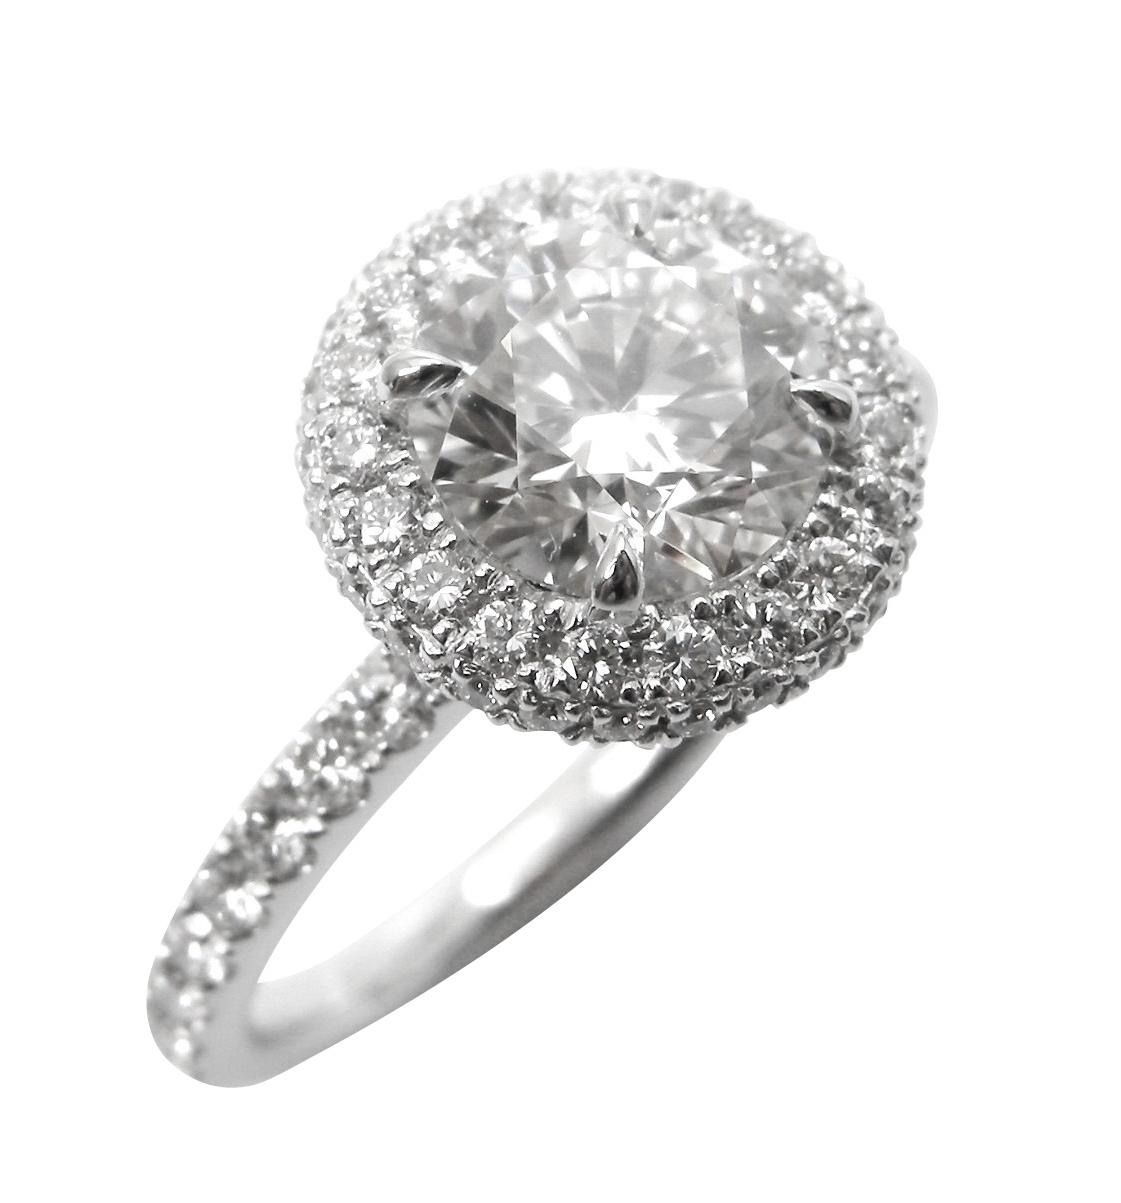 ROUND DIAMOND RING WITH DIAMOND HALO AND HIDDEN HALO BESPOKE FINE JEWELLERY BY SHAHINA HATTA